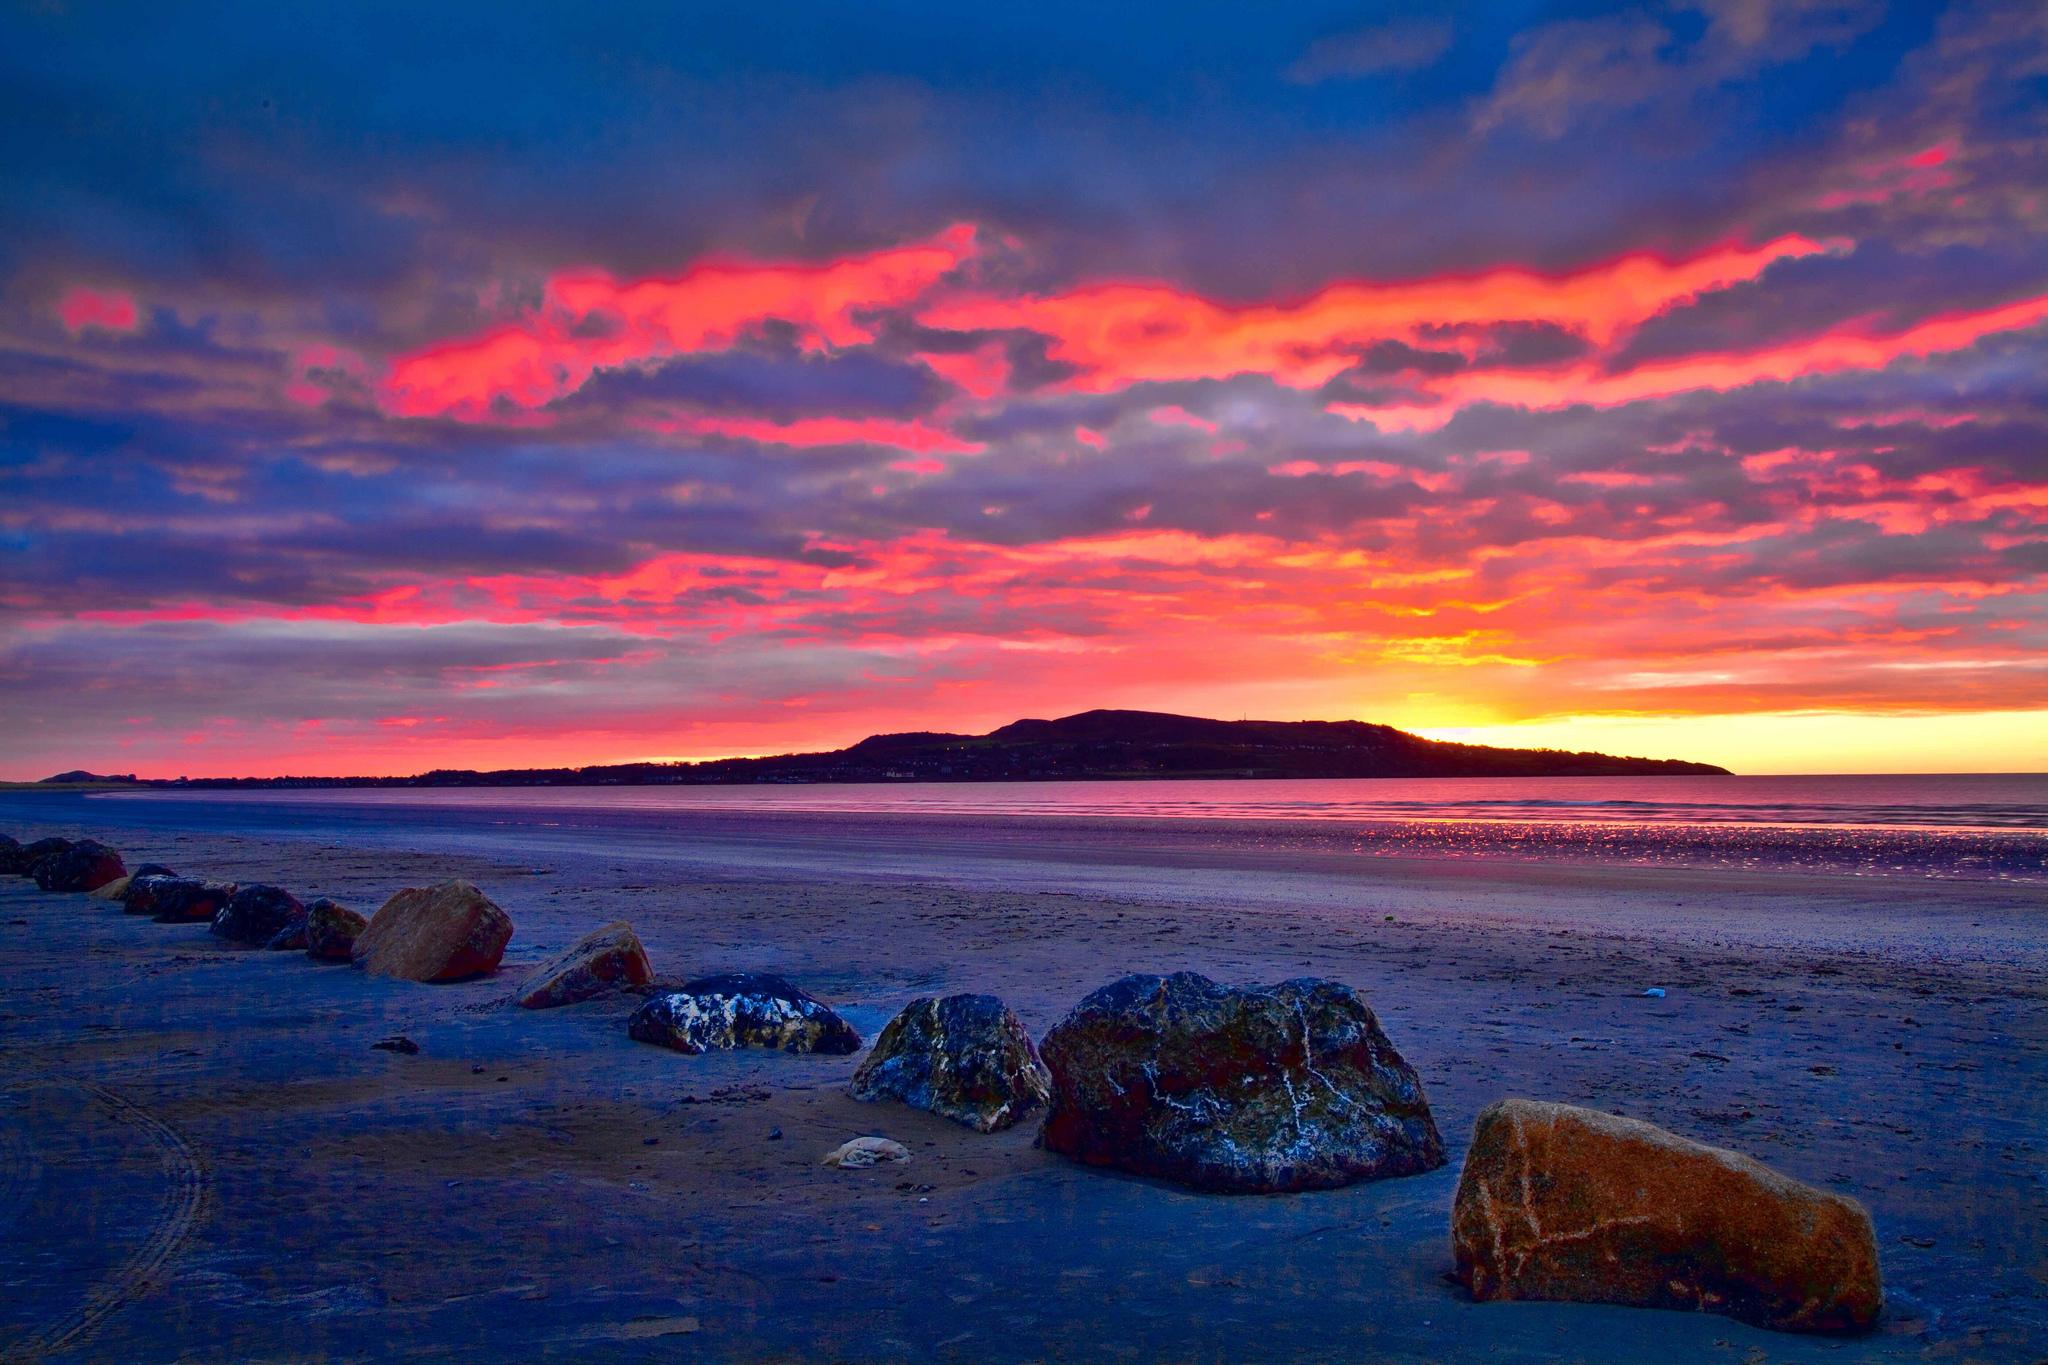 Iceland beach rocks bay sunrise wallpaper 2048x1365 for Sfondi desktop tramonti mare